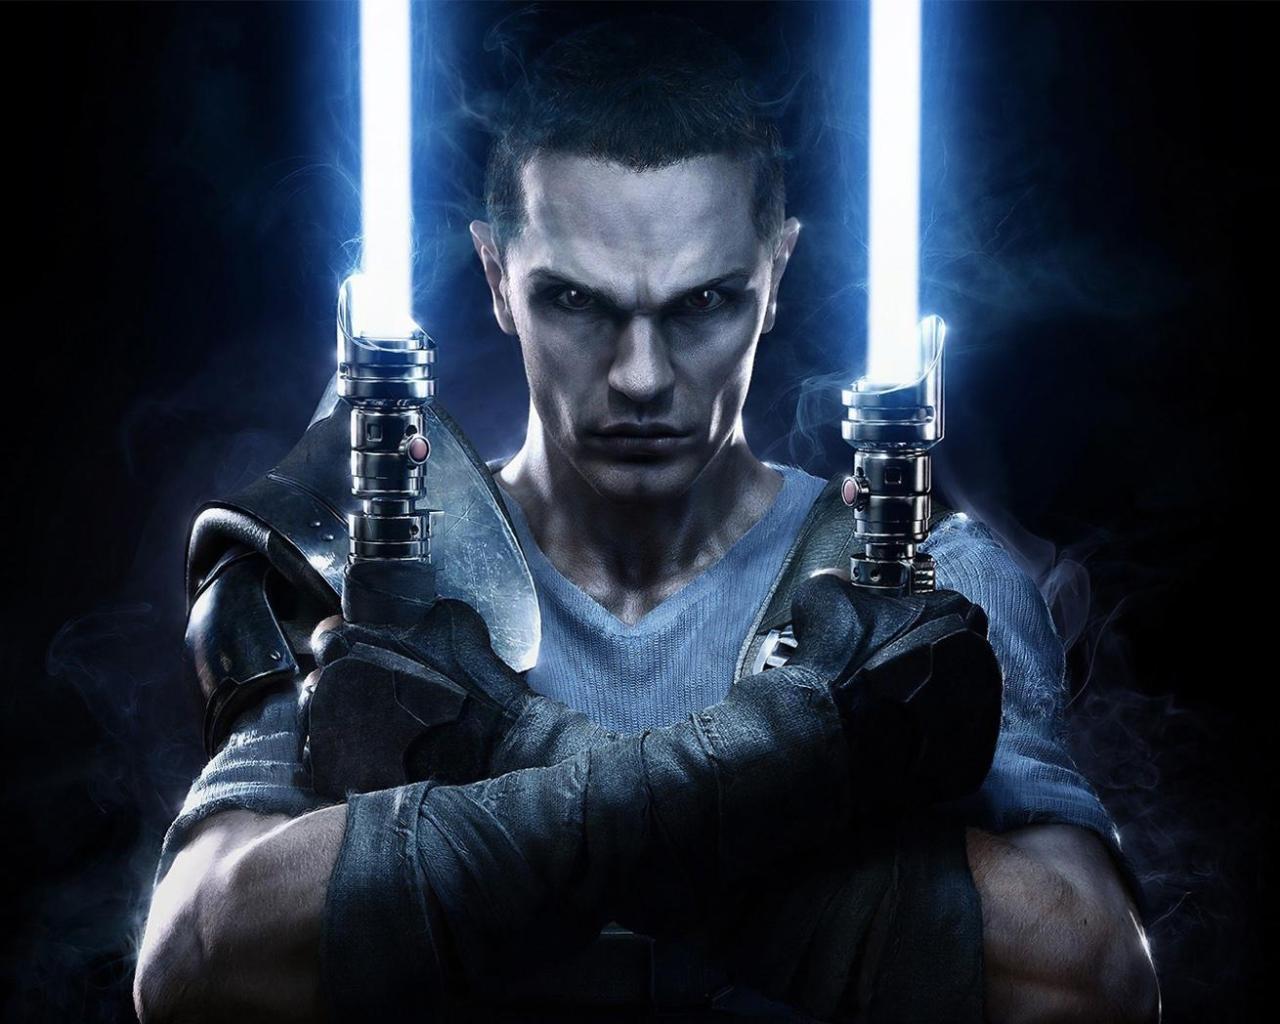 Wallpapers free downloads - hhg1216: Best Star Wars Wallpaper